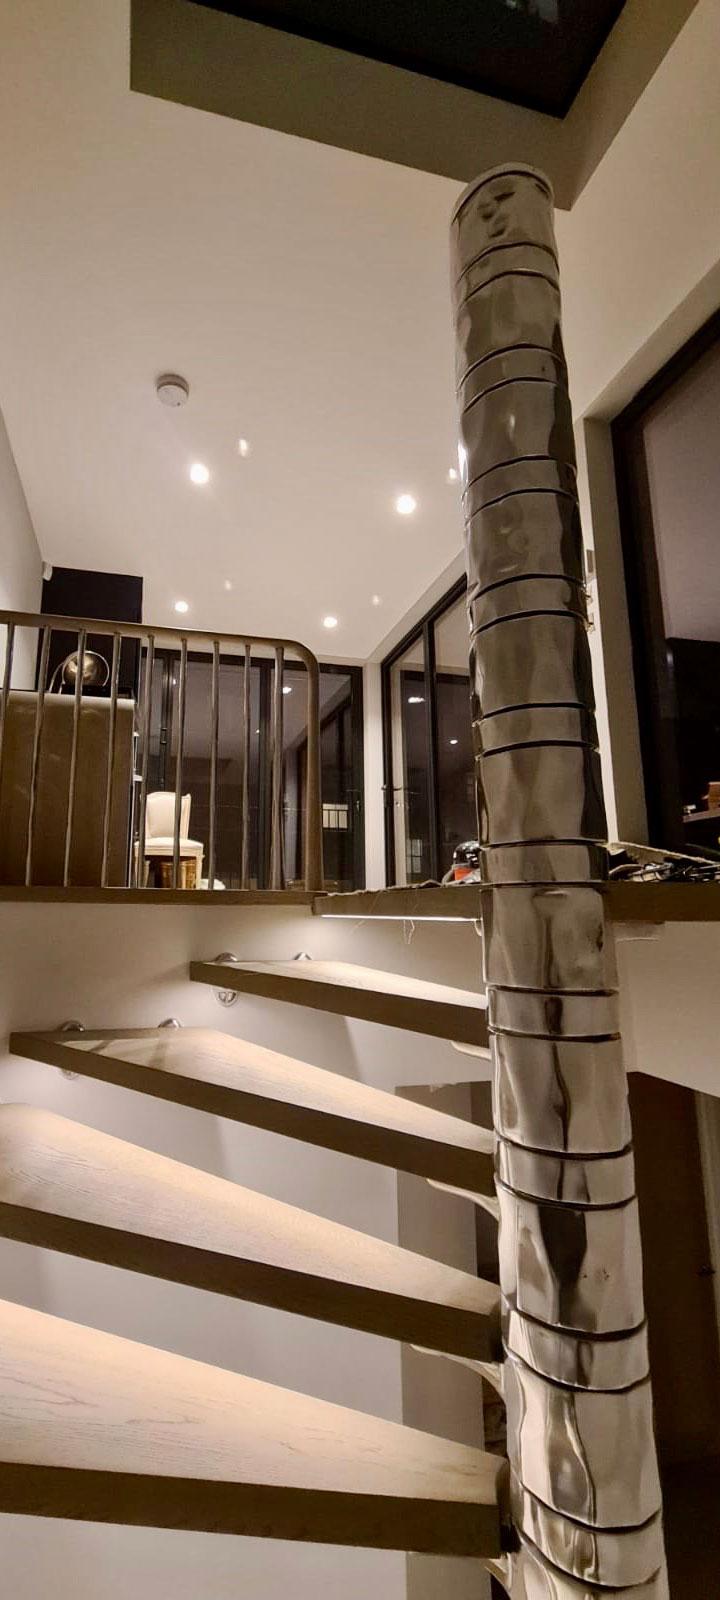 laverton2 Laverton Staircase